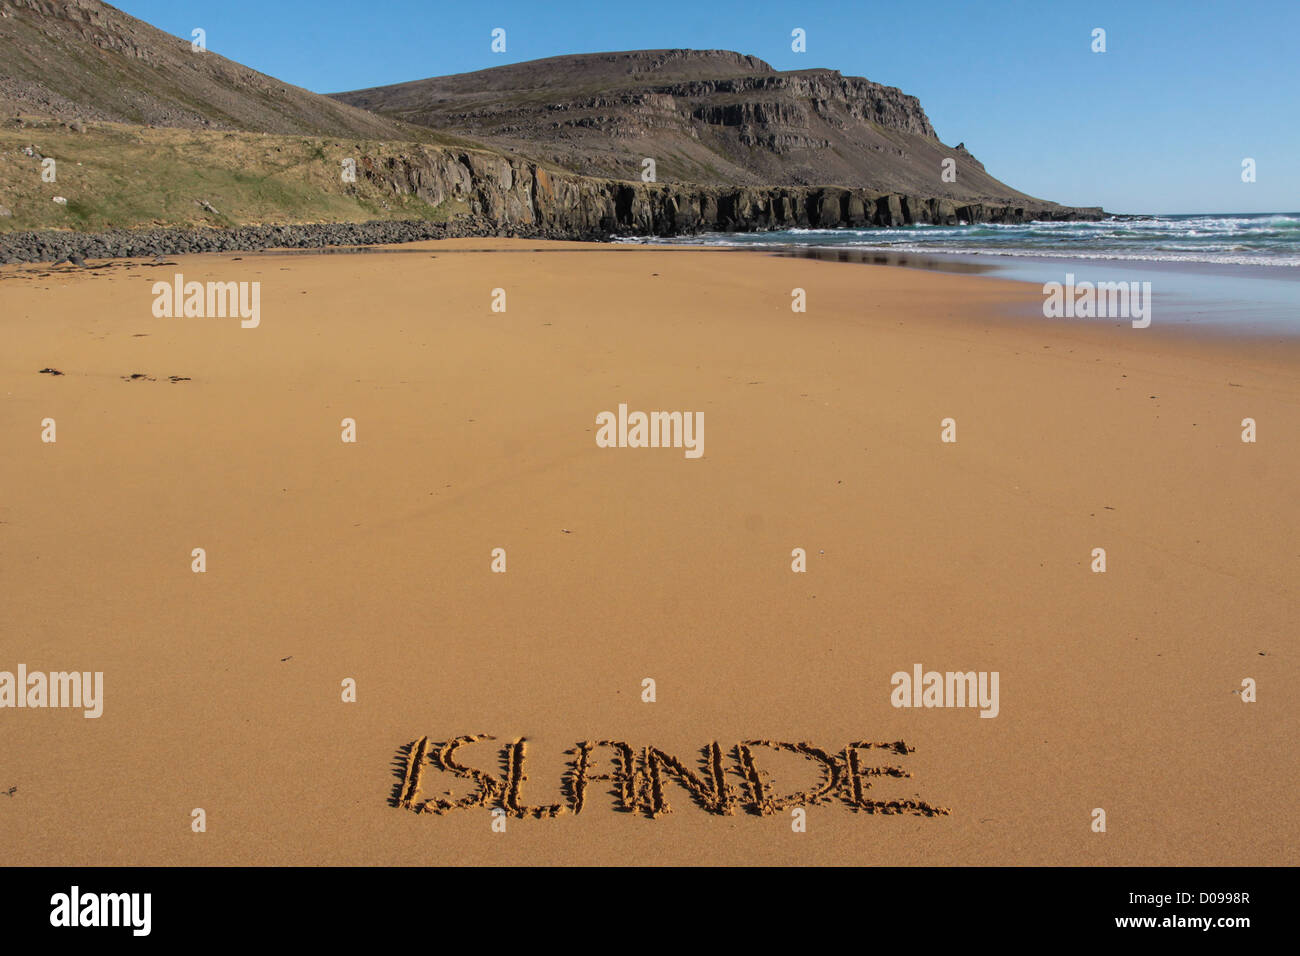 THE FRENCH NAME ICELAND WRITTEN IN EPHEMERAL MANNER IN SAND BEACH RAUDISANDUR REGION WESTERN FJORDS VESTFJORDS ICELAND - Stock Image